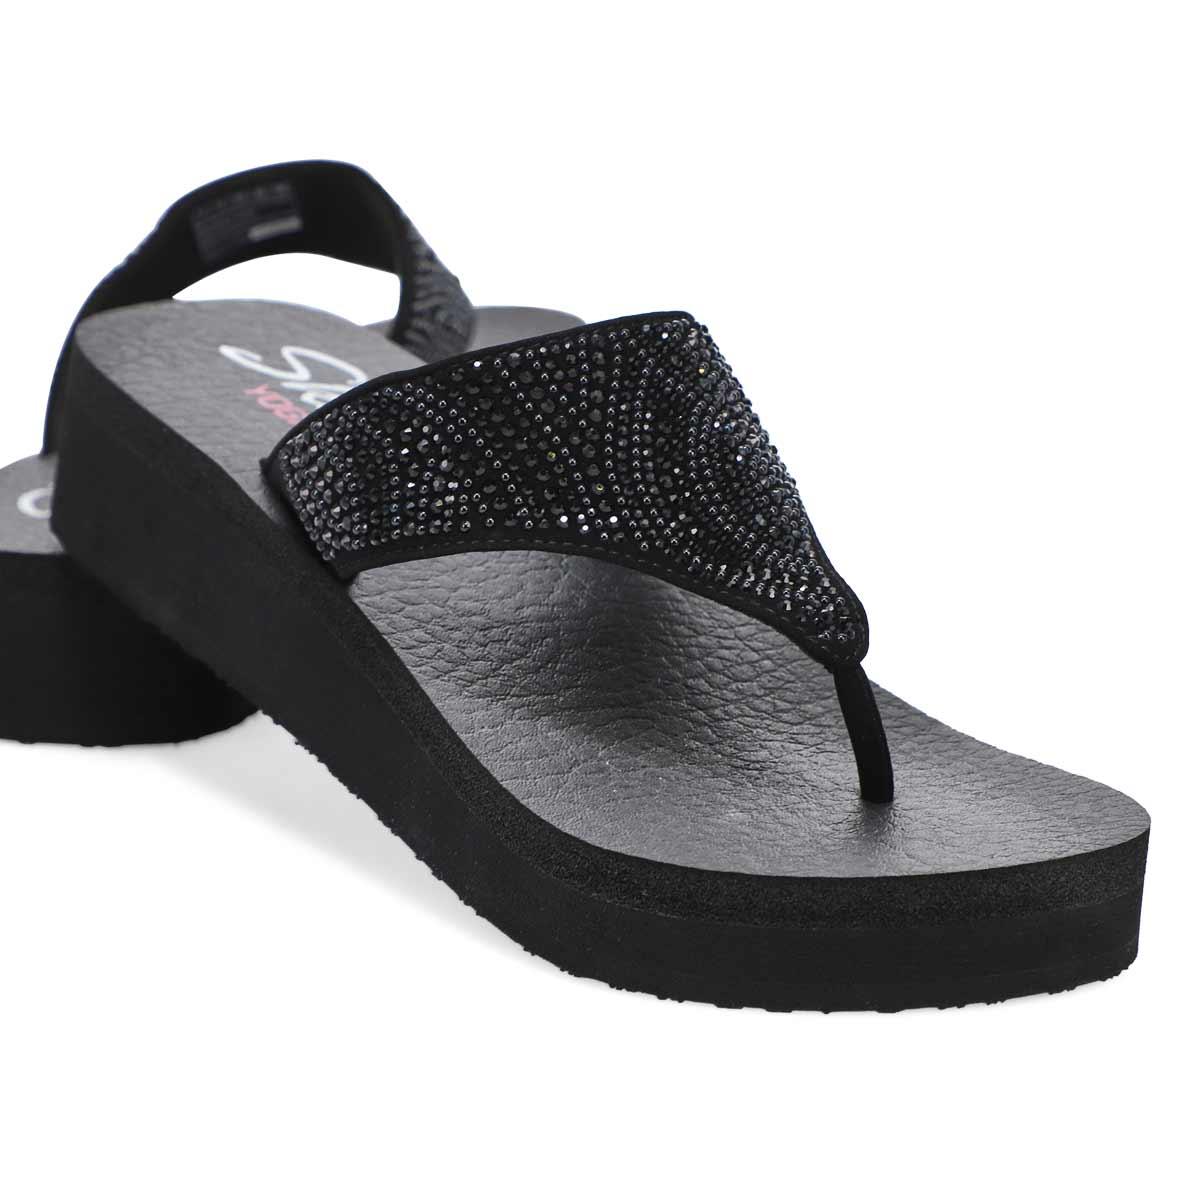 Women's Vinyasa Stone Candy Sandals - Black